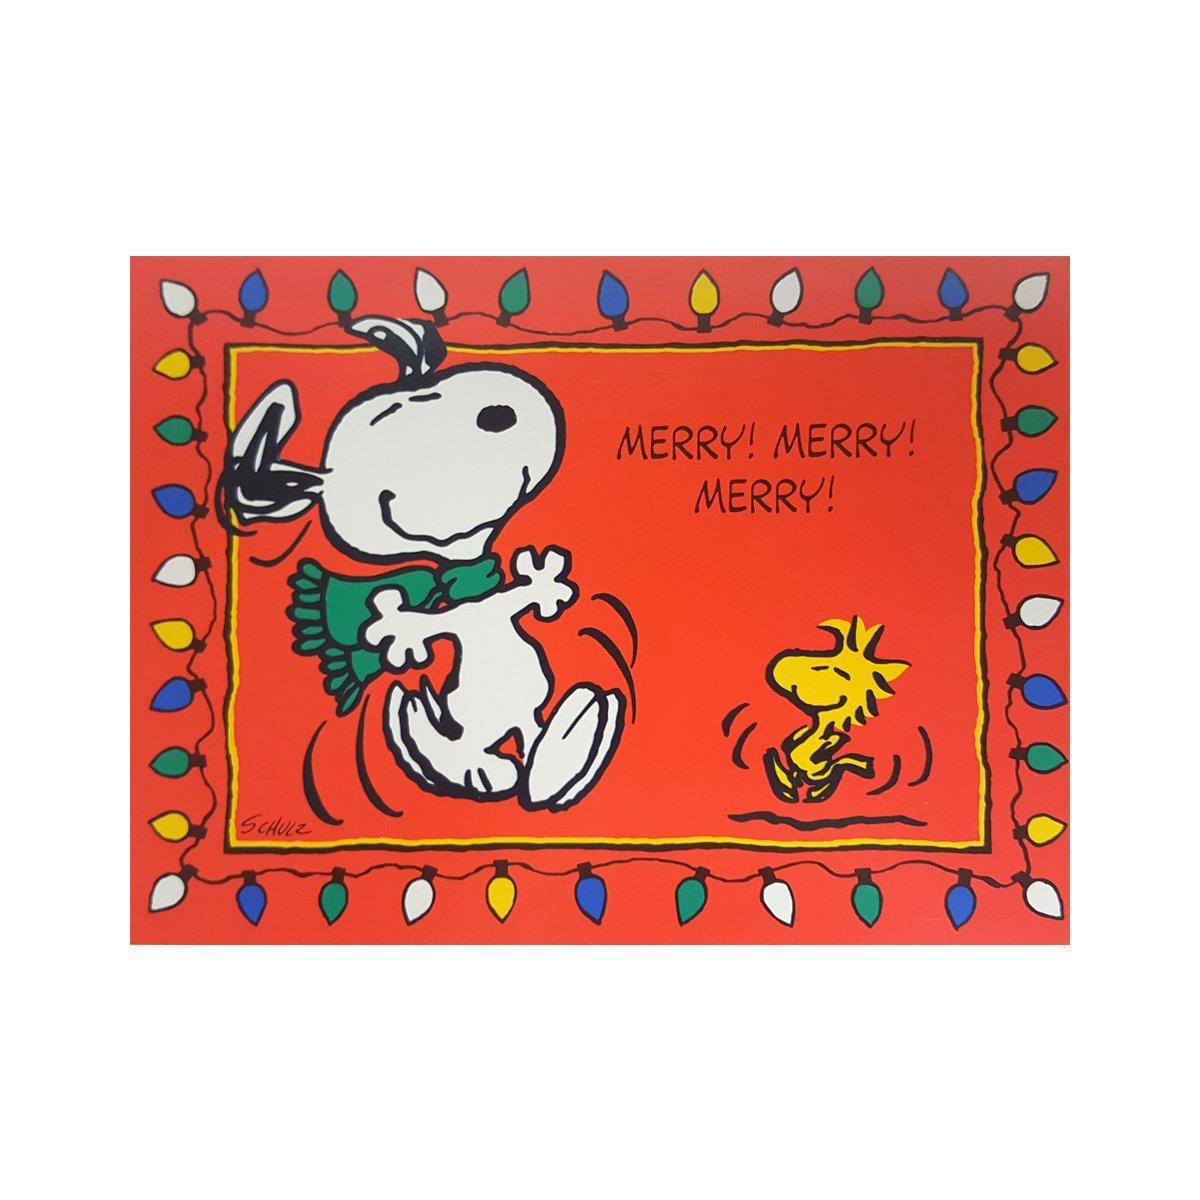 Snoopy Christmas Cards.Amazon Com Hallmark Snoopy And Woodstock 8 Christmas Cards